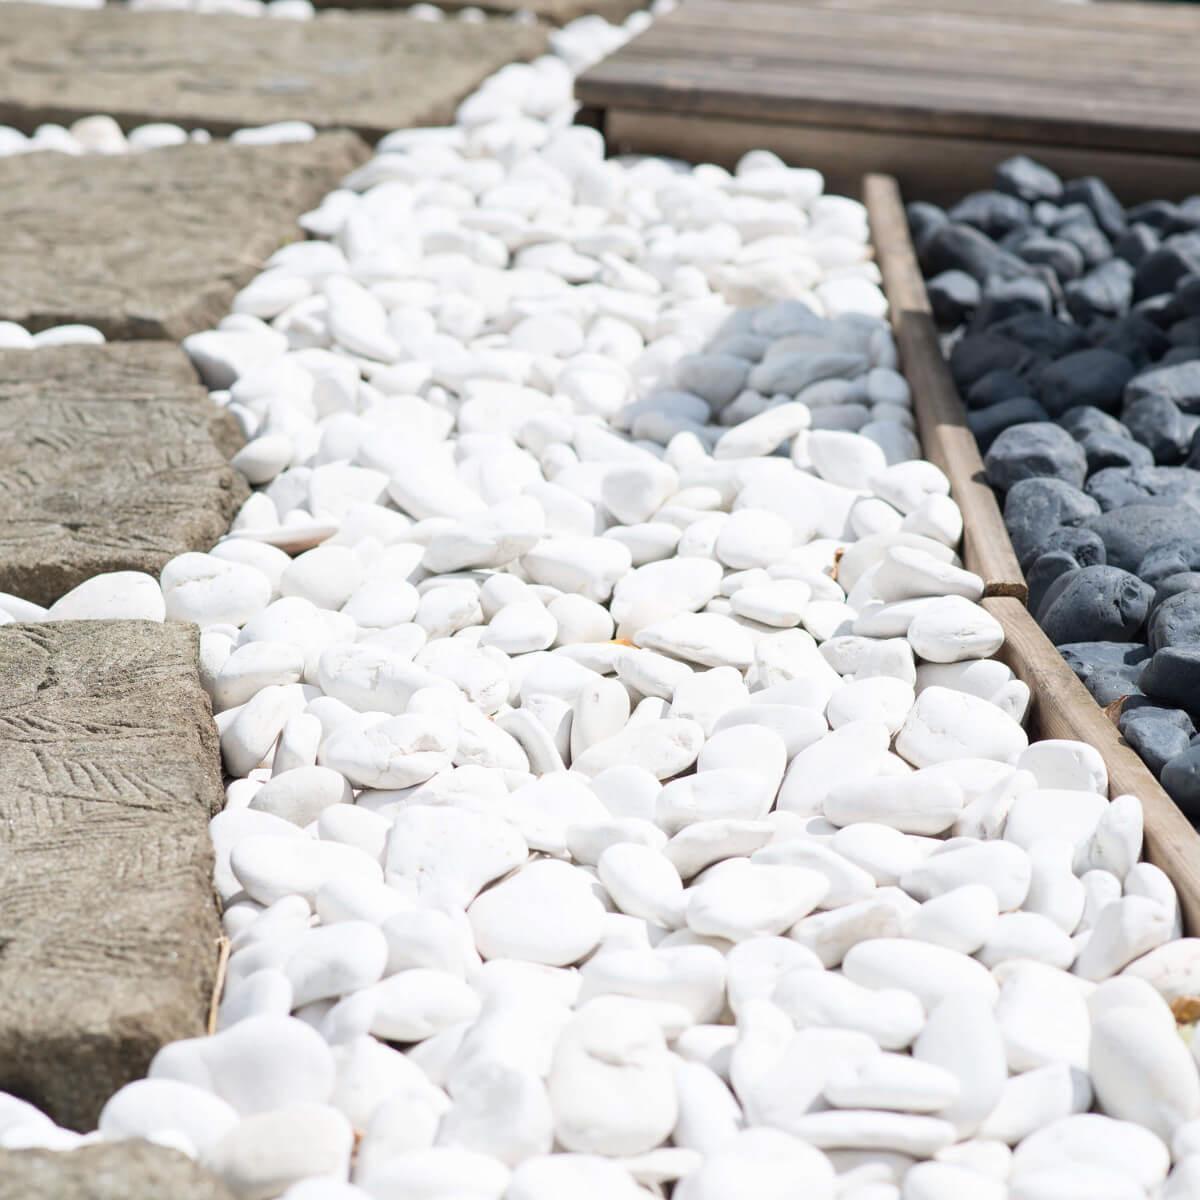 5 Bolsas De Piedras Blancas De 20 Kg